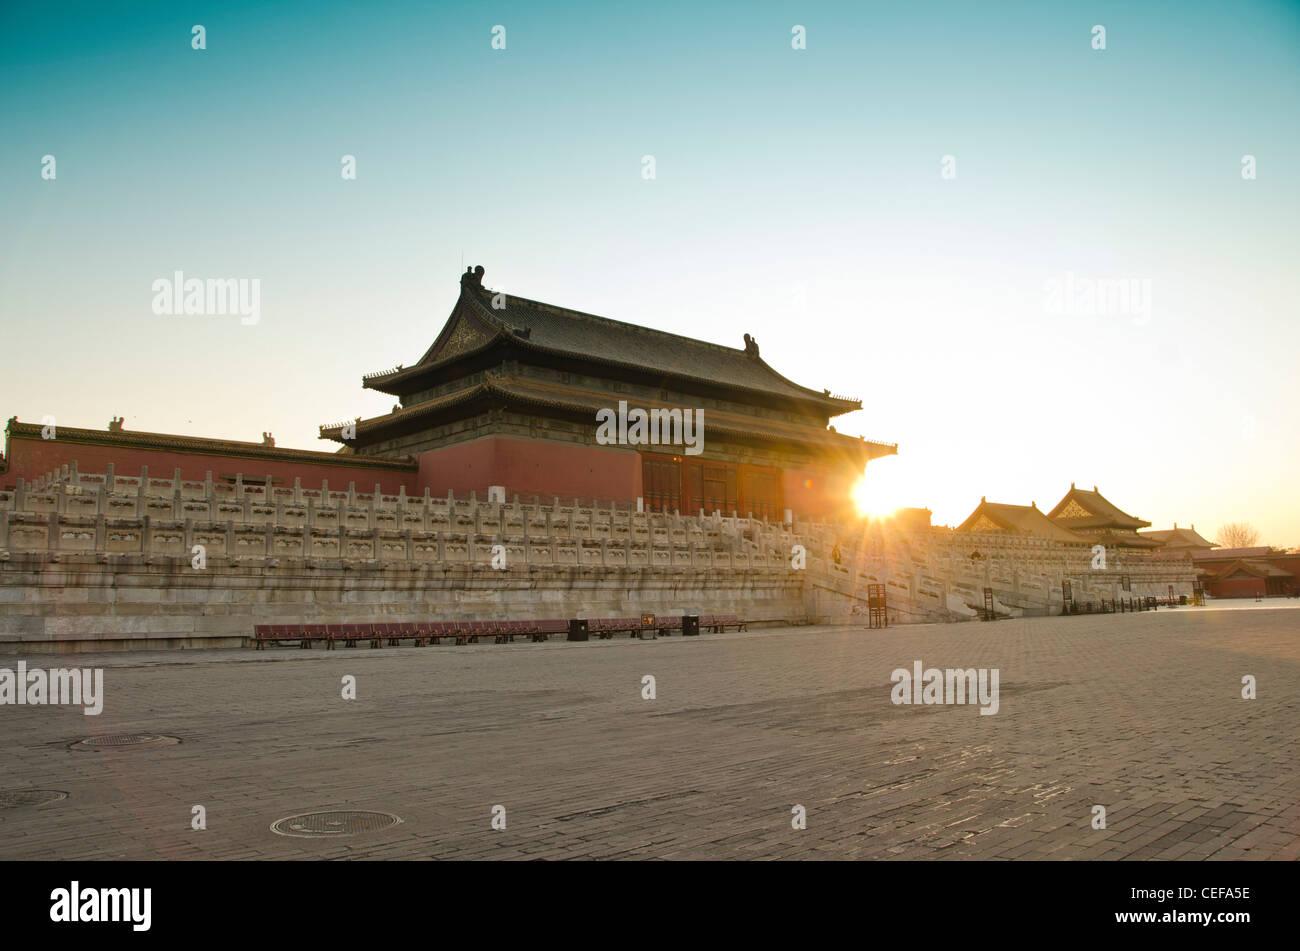 Die Verbotene Stadt (Palast) in Peking, China Stockfoto